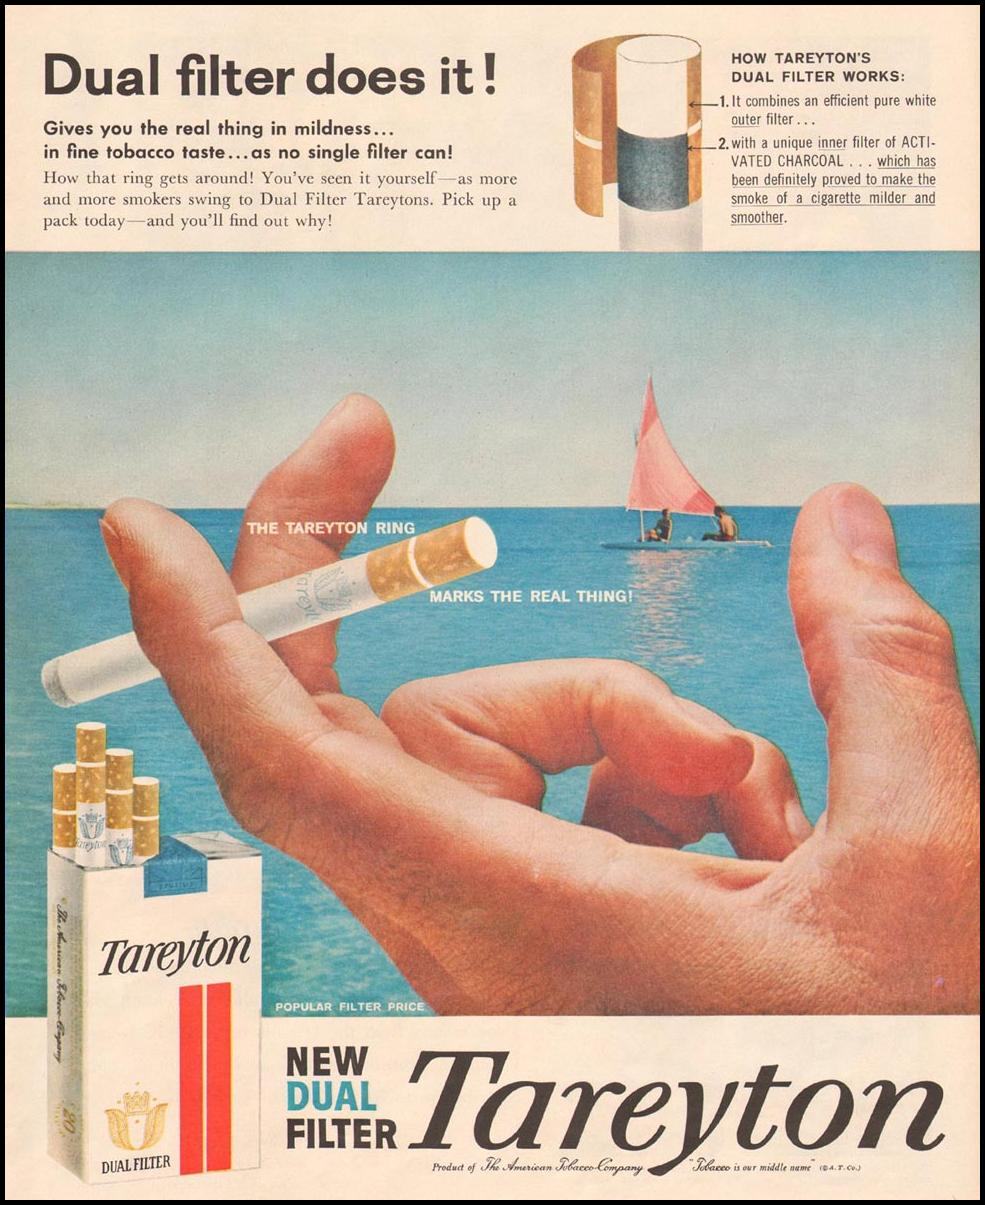 TAREYTON CIGARETTES LIFE 08/10/1958